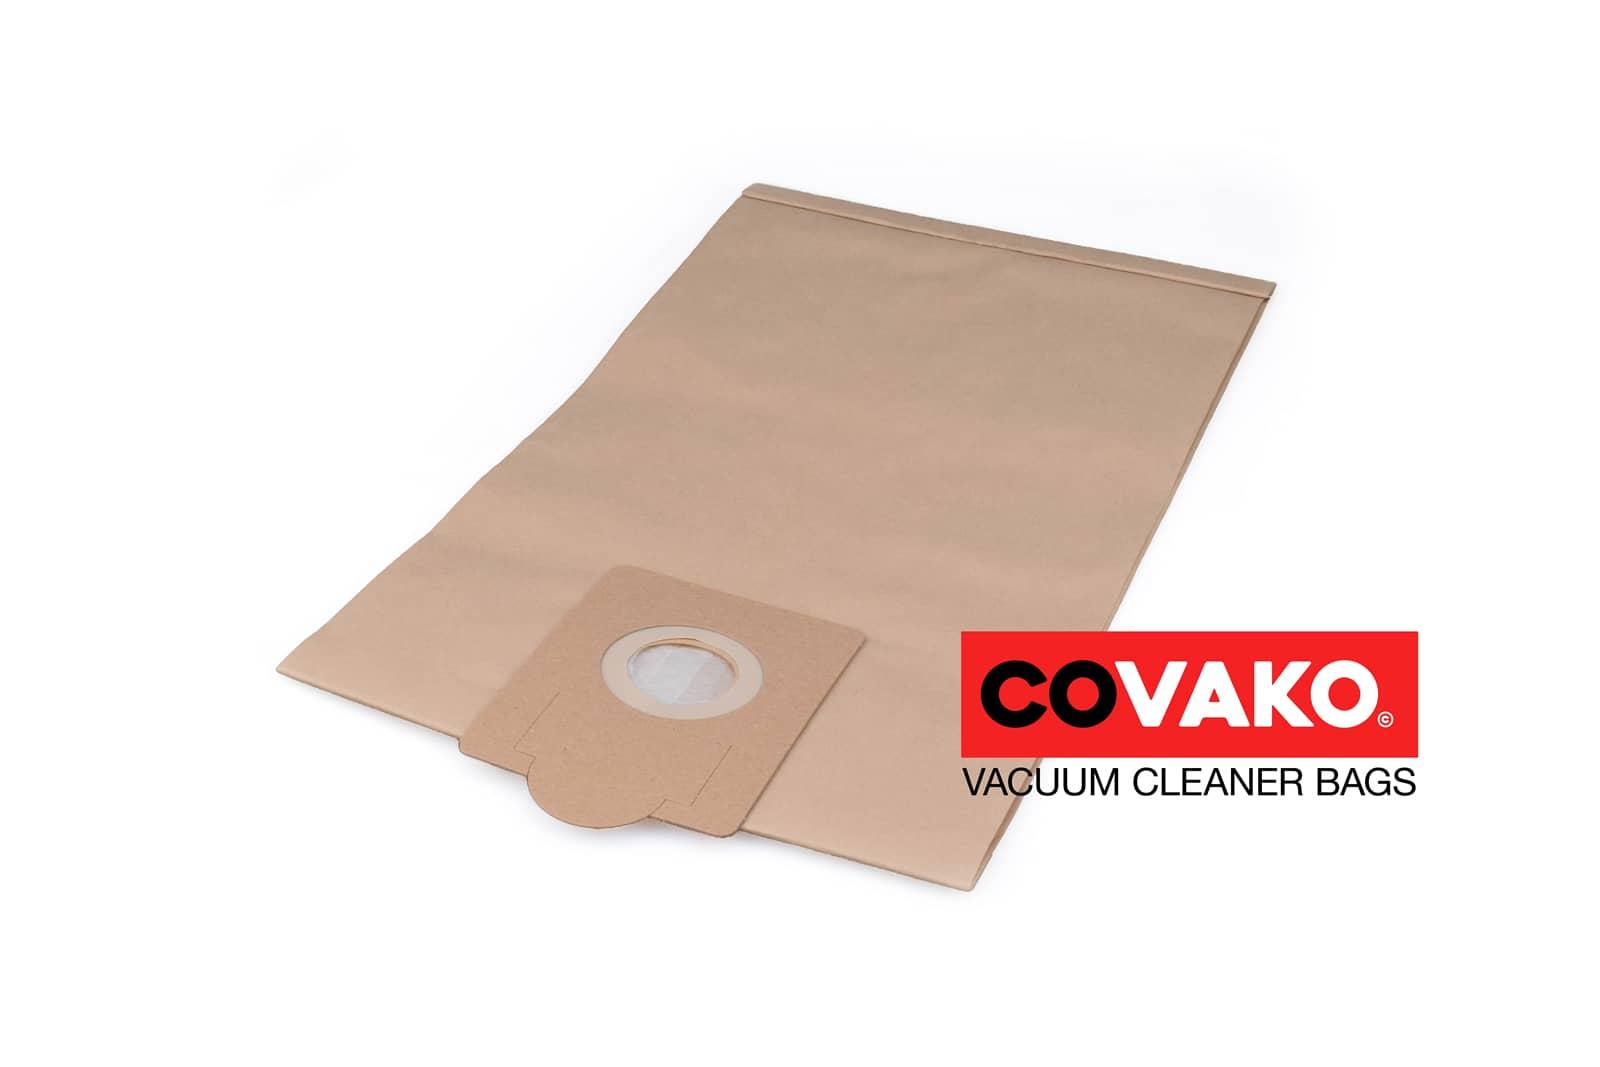 Fast K103200941 / Paper - Fast vacuum cleaner bags